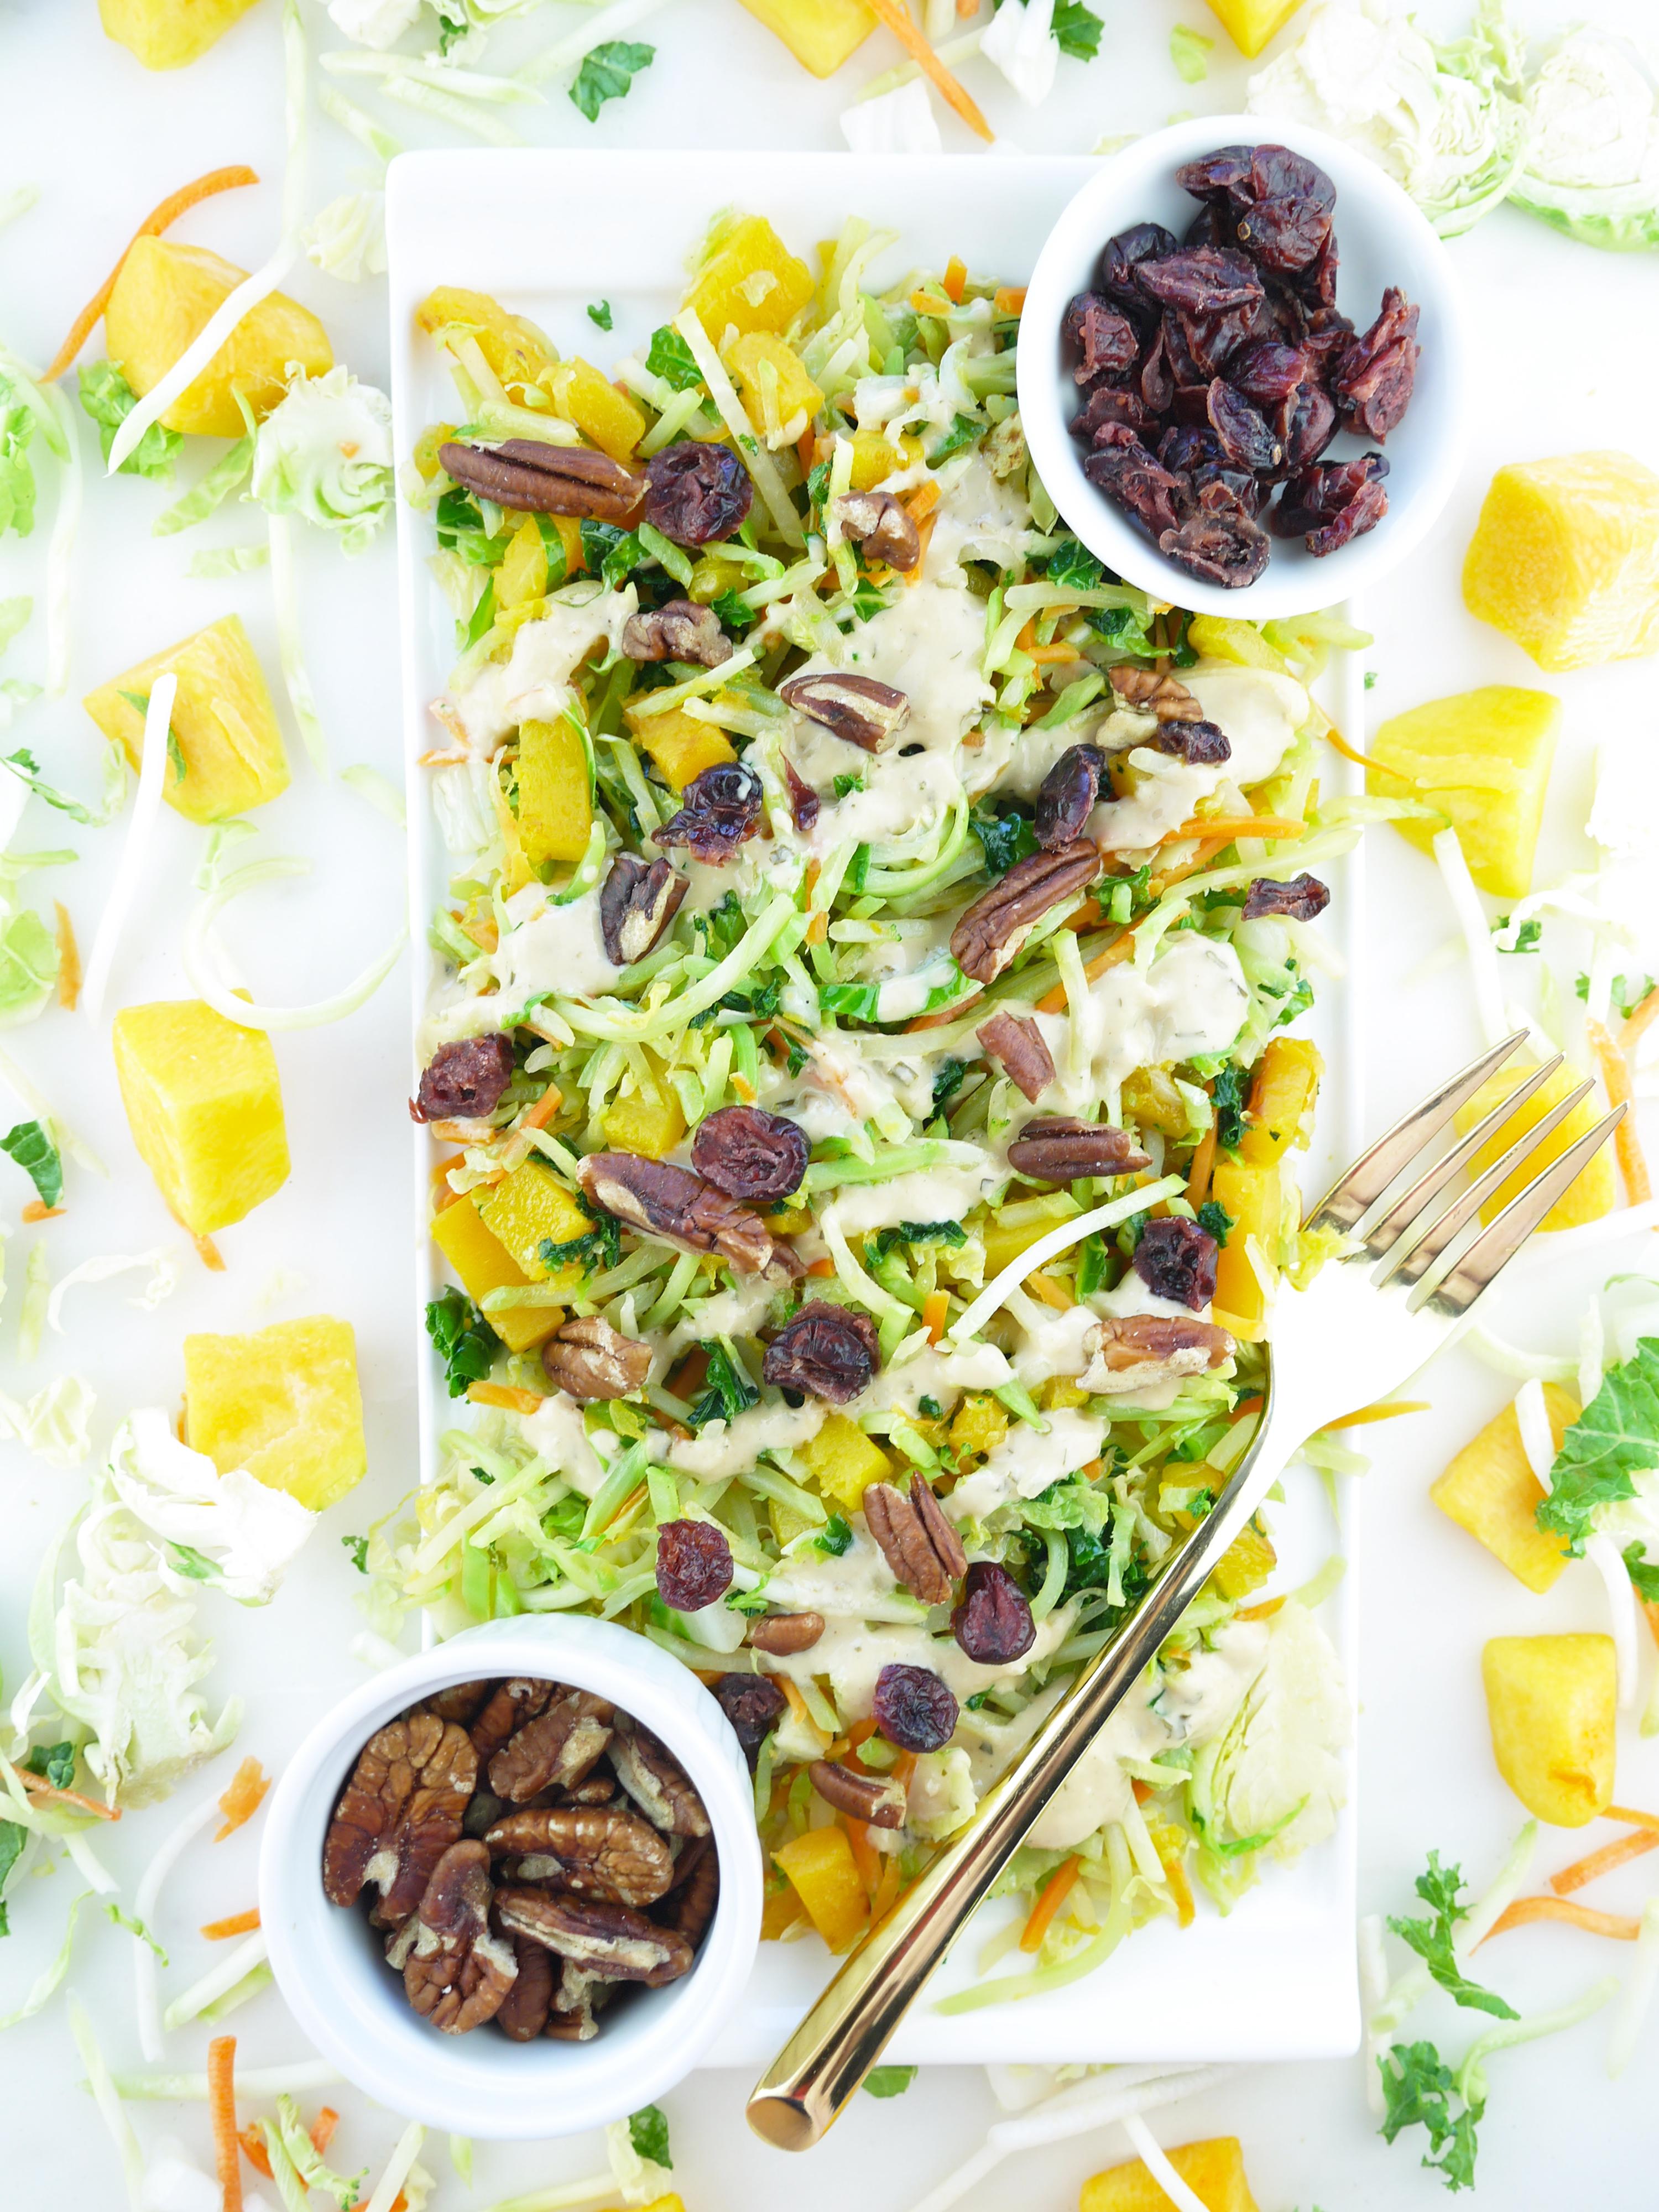 http://nutritionbymia.com/warm-fall-salad